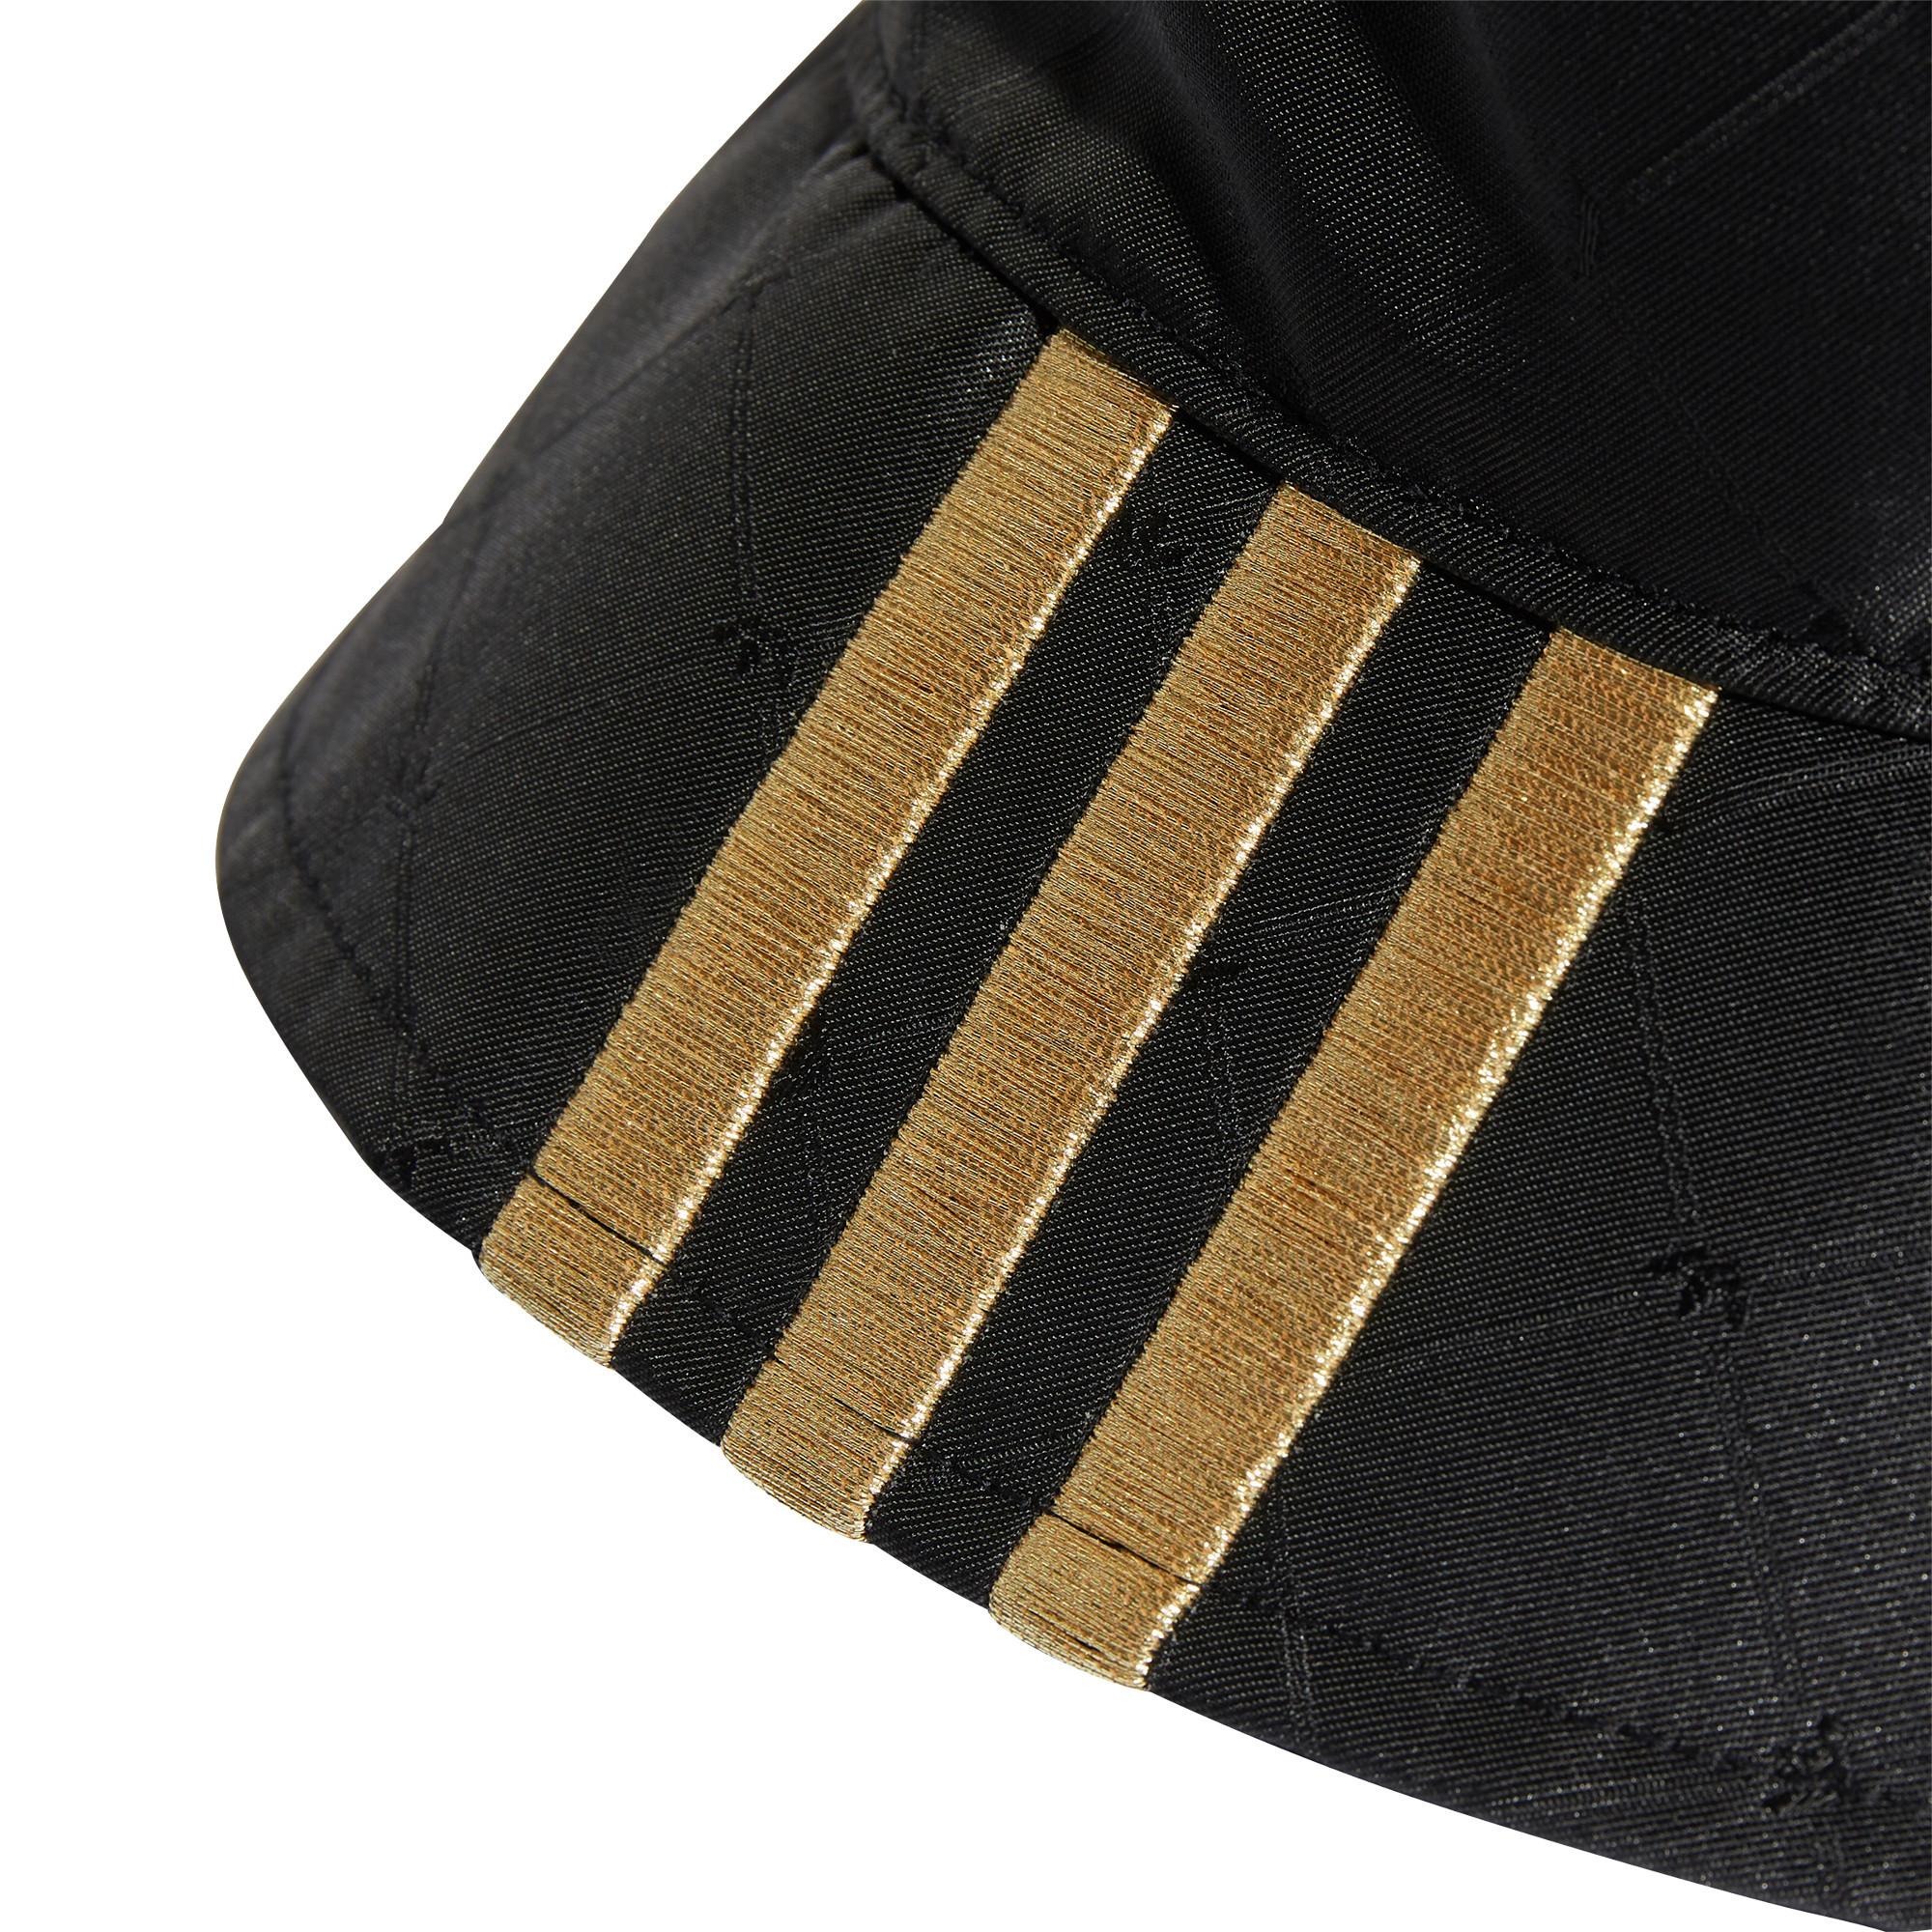 Cappello Adicolor Bucket, Nero, large image number 3